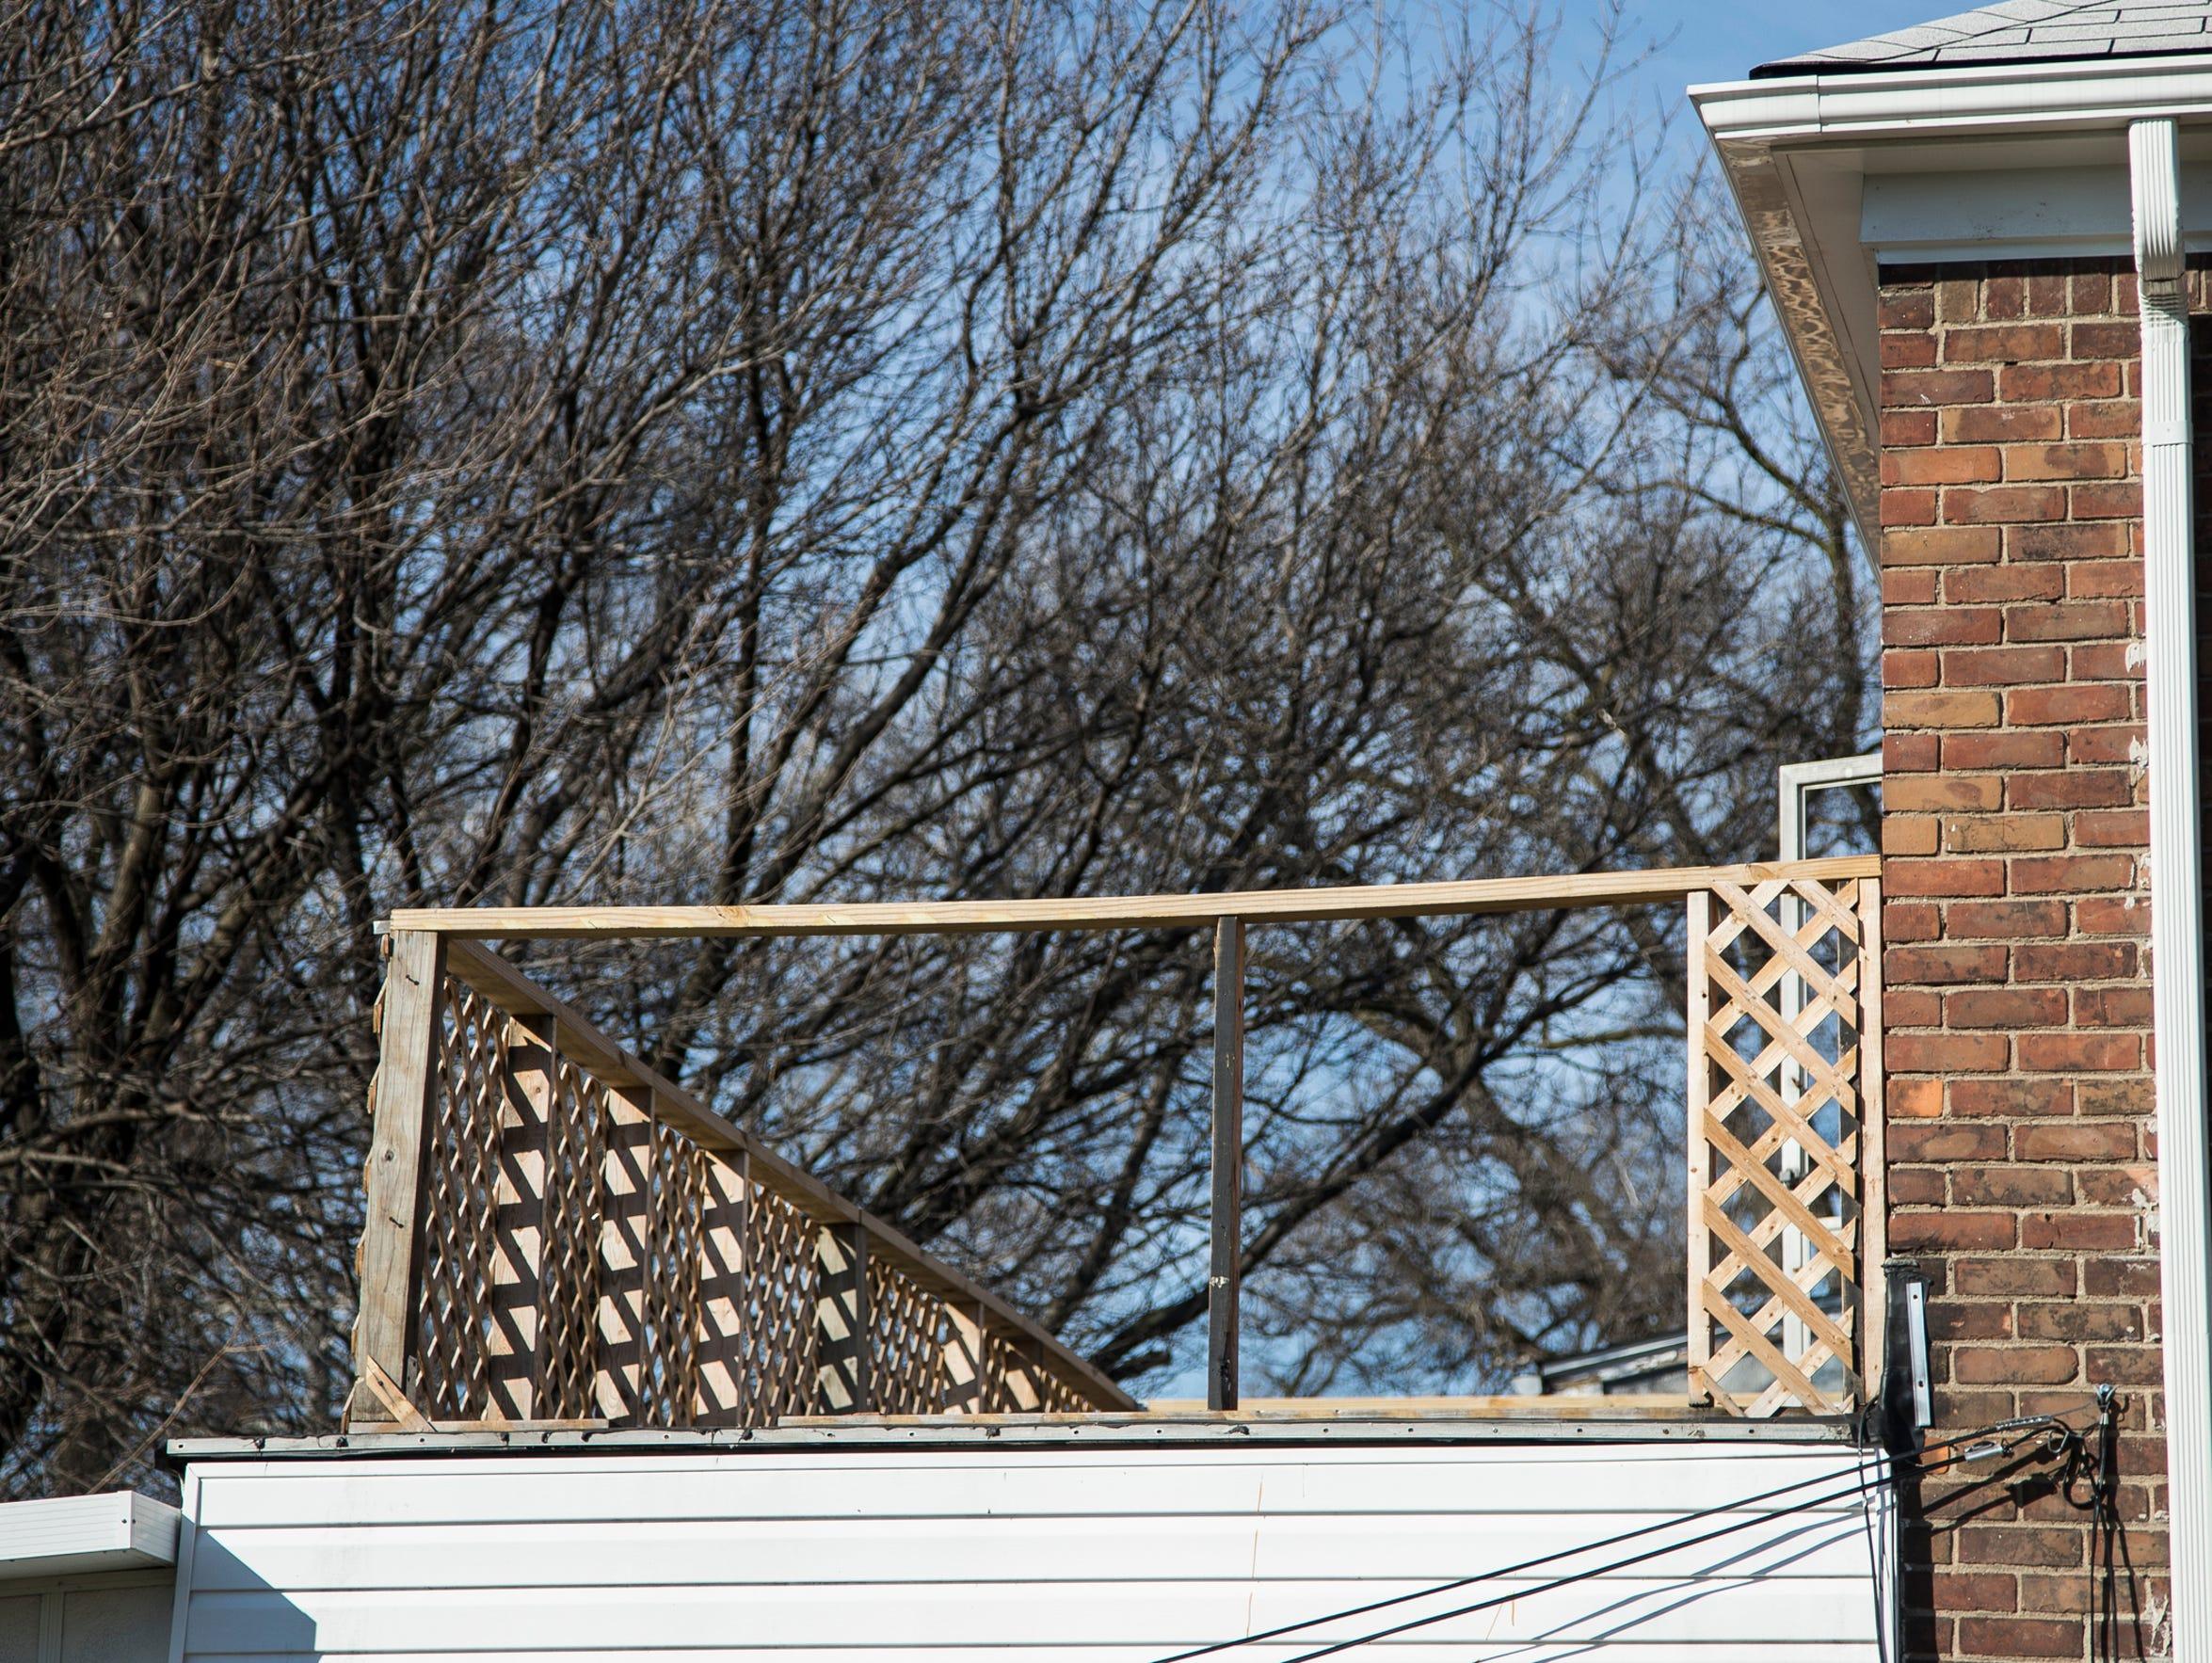 The second floor balcony of Lori Adams' home in Detroit,